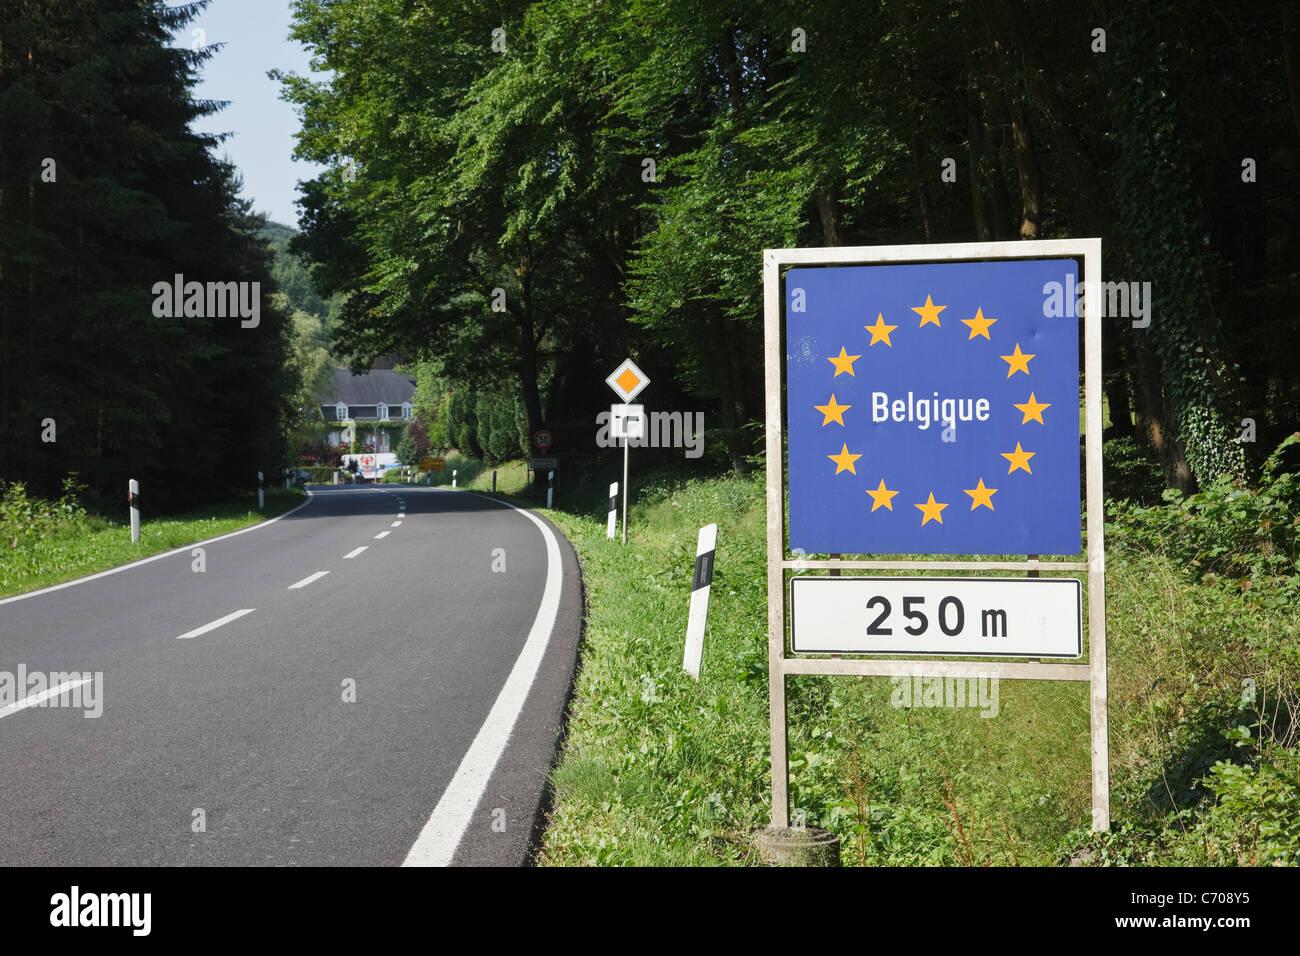 Road to Belgium with EU Belgian border sign Belgique. Grand Duchy of Luxembourg, Europe. - Stock Image